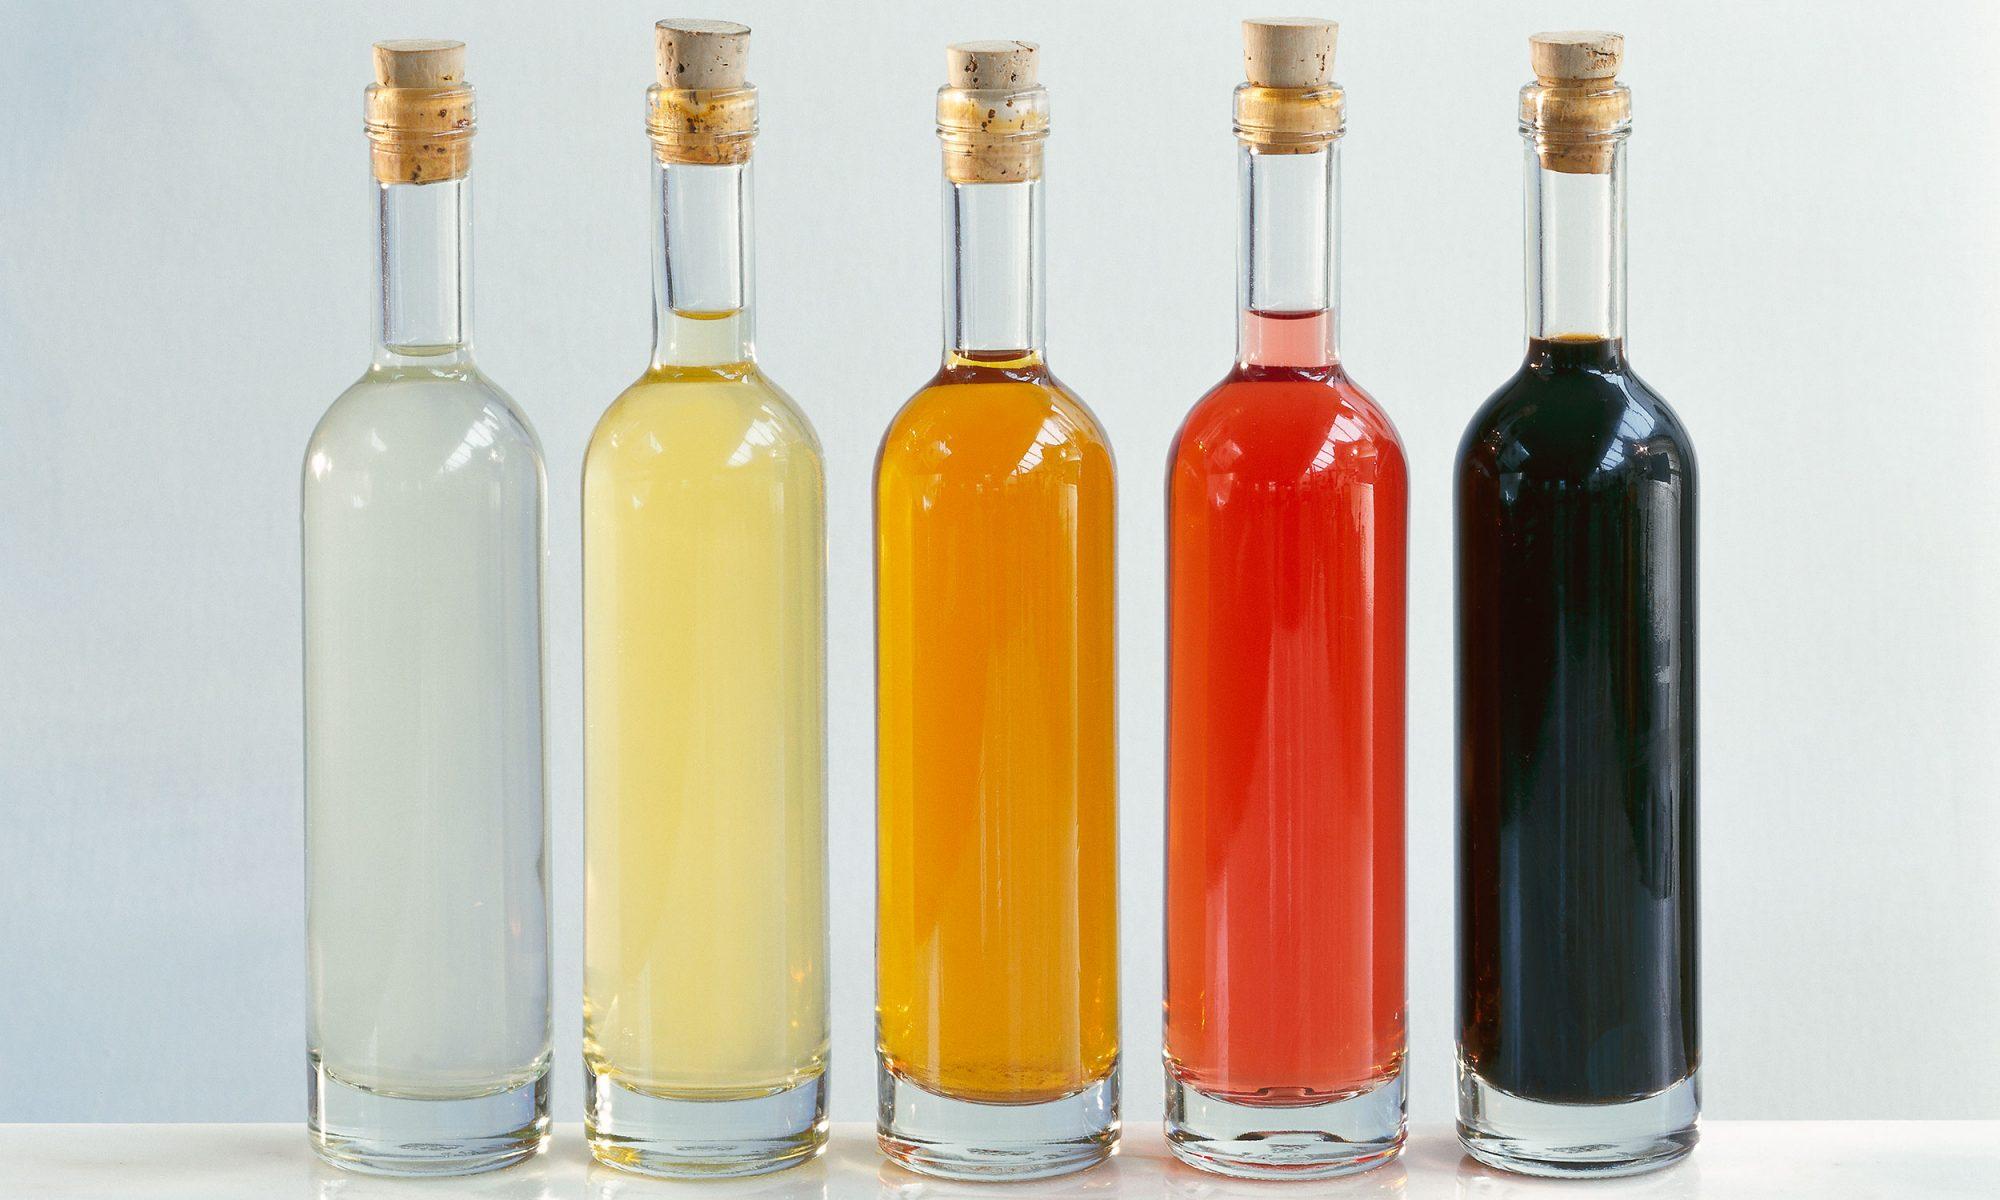 Does Vinegar Go Bad?